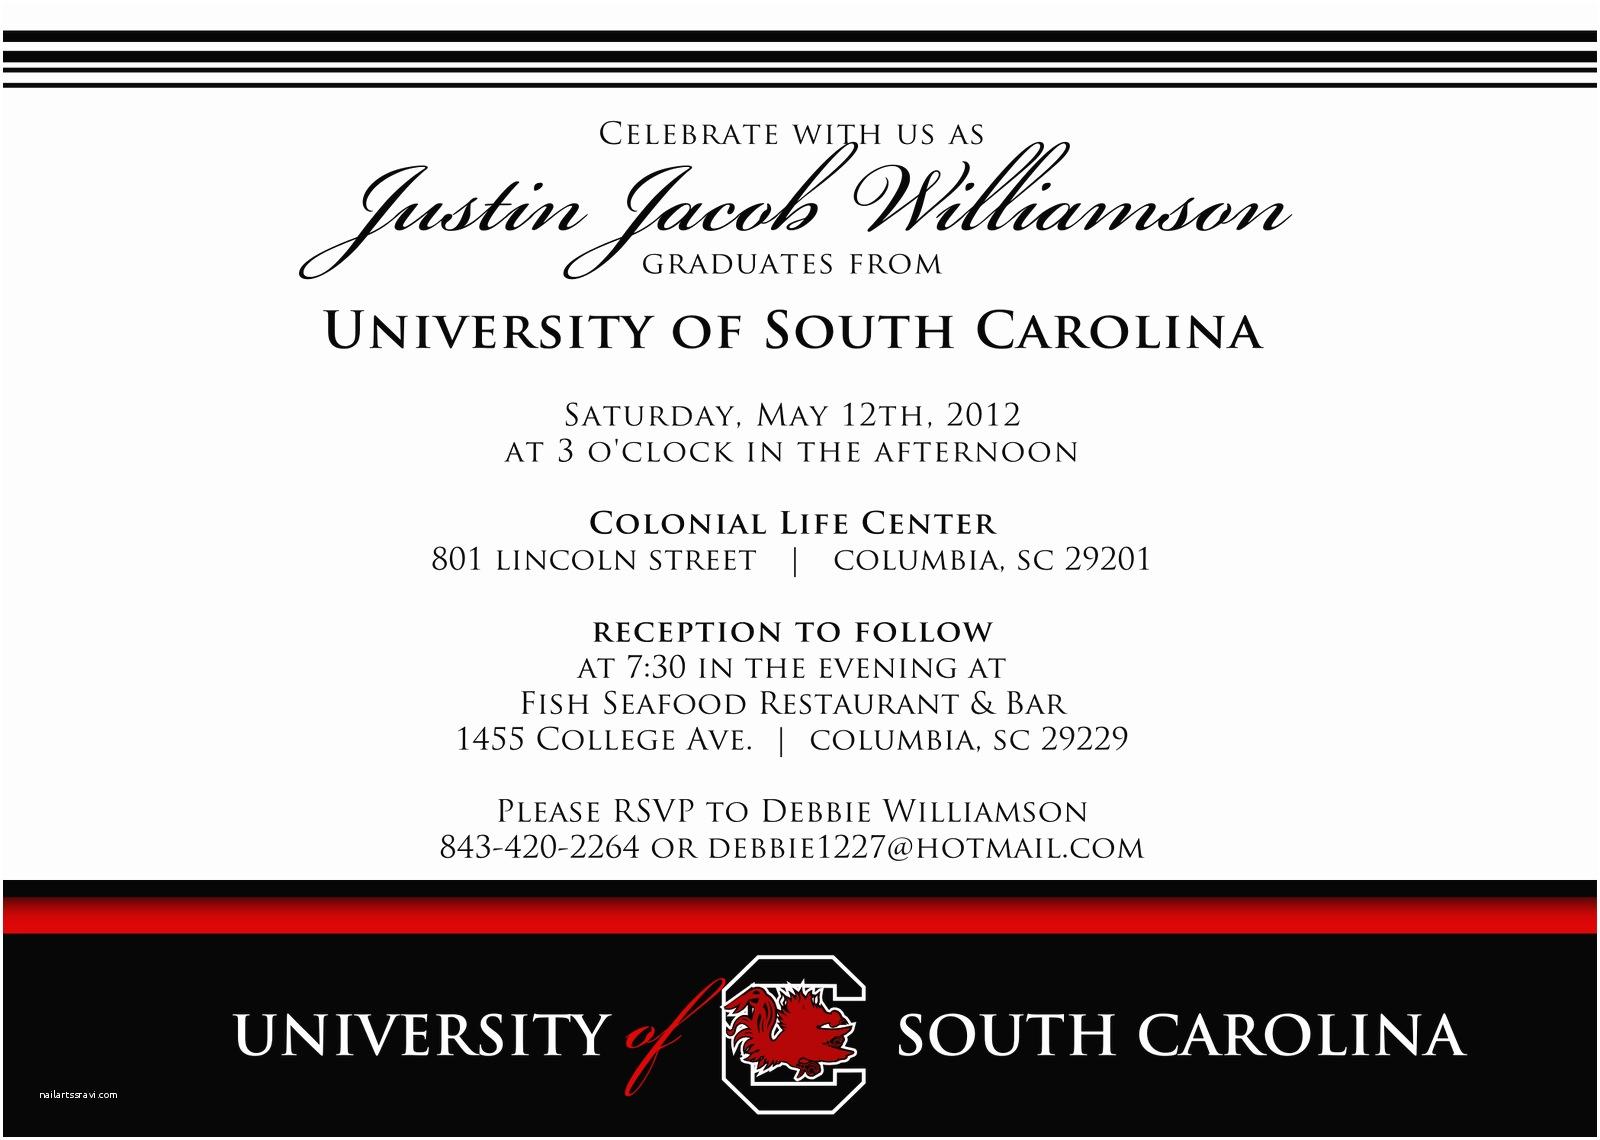 Examples Of Graduation Invitations Graduation Dinner Invitation Wording